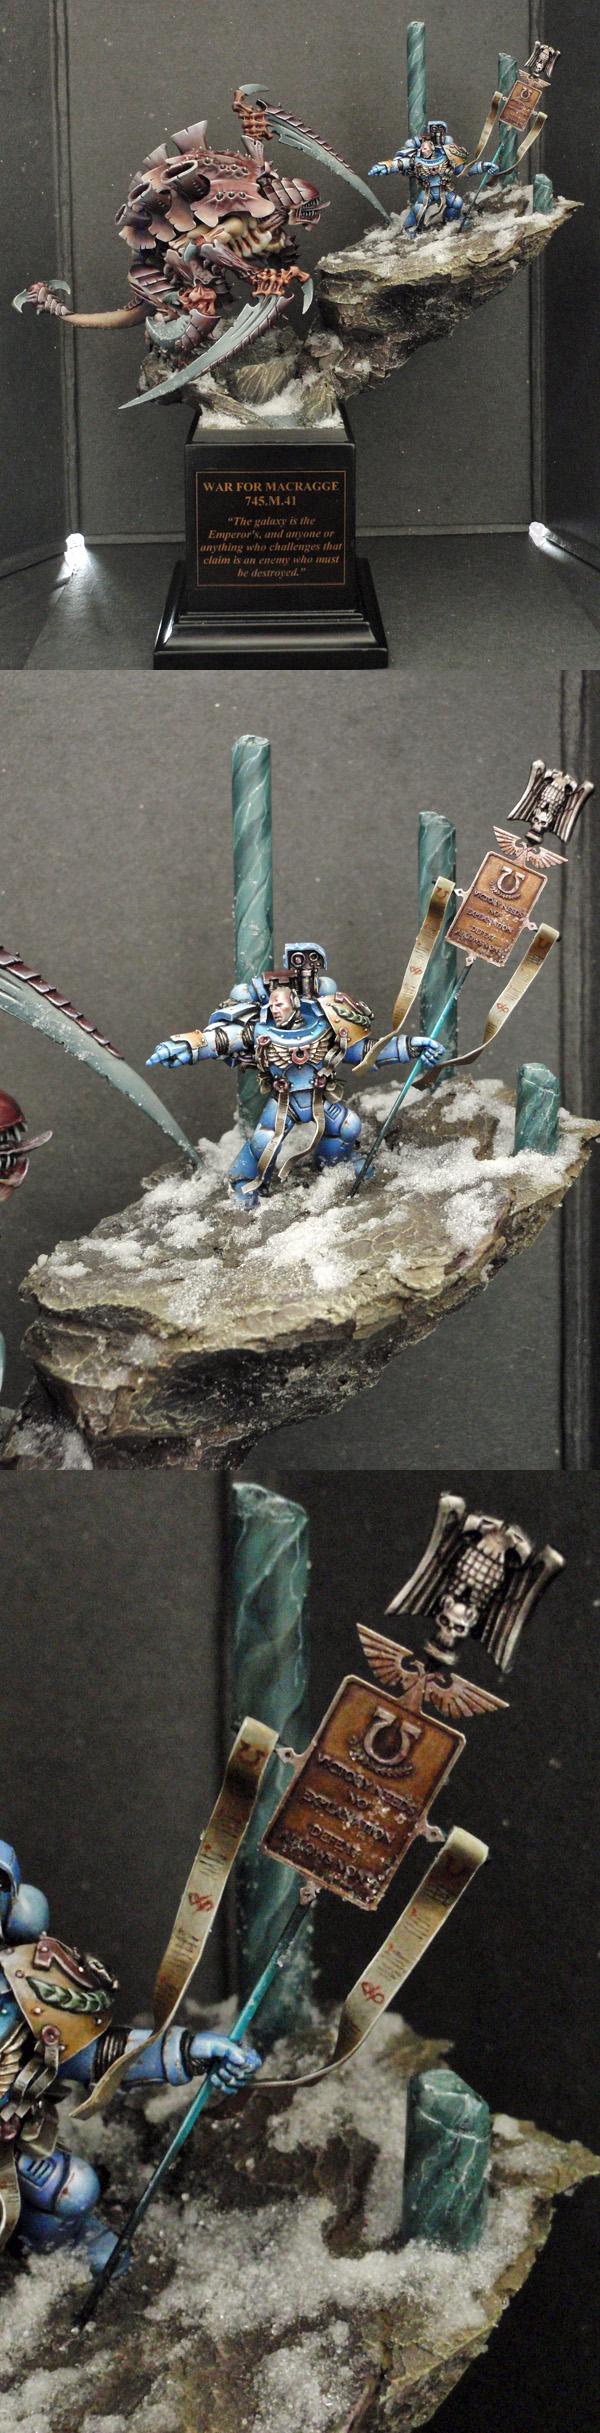 Ultramarine warrior, War For Macragge 745.M.41